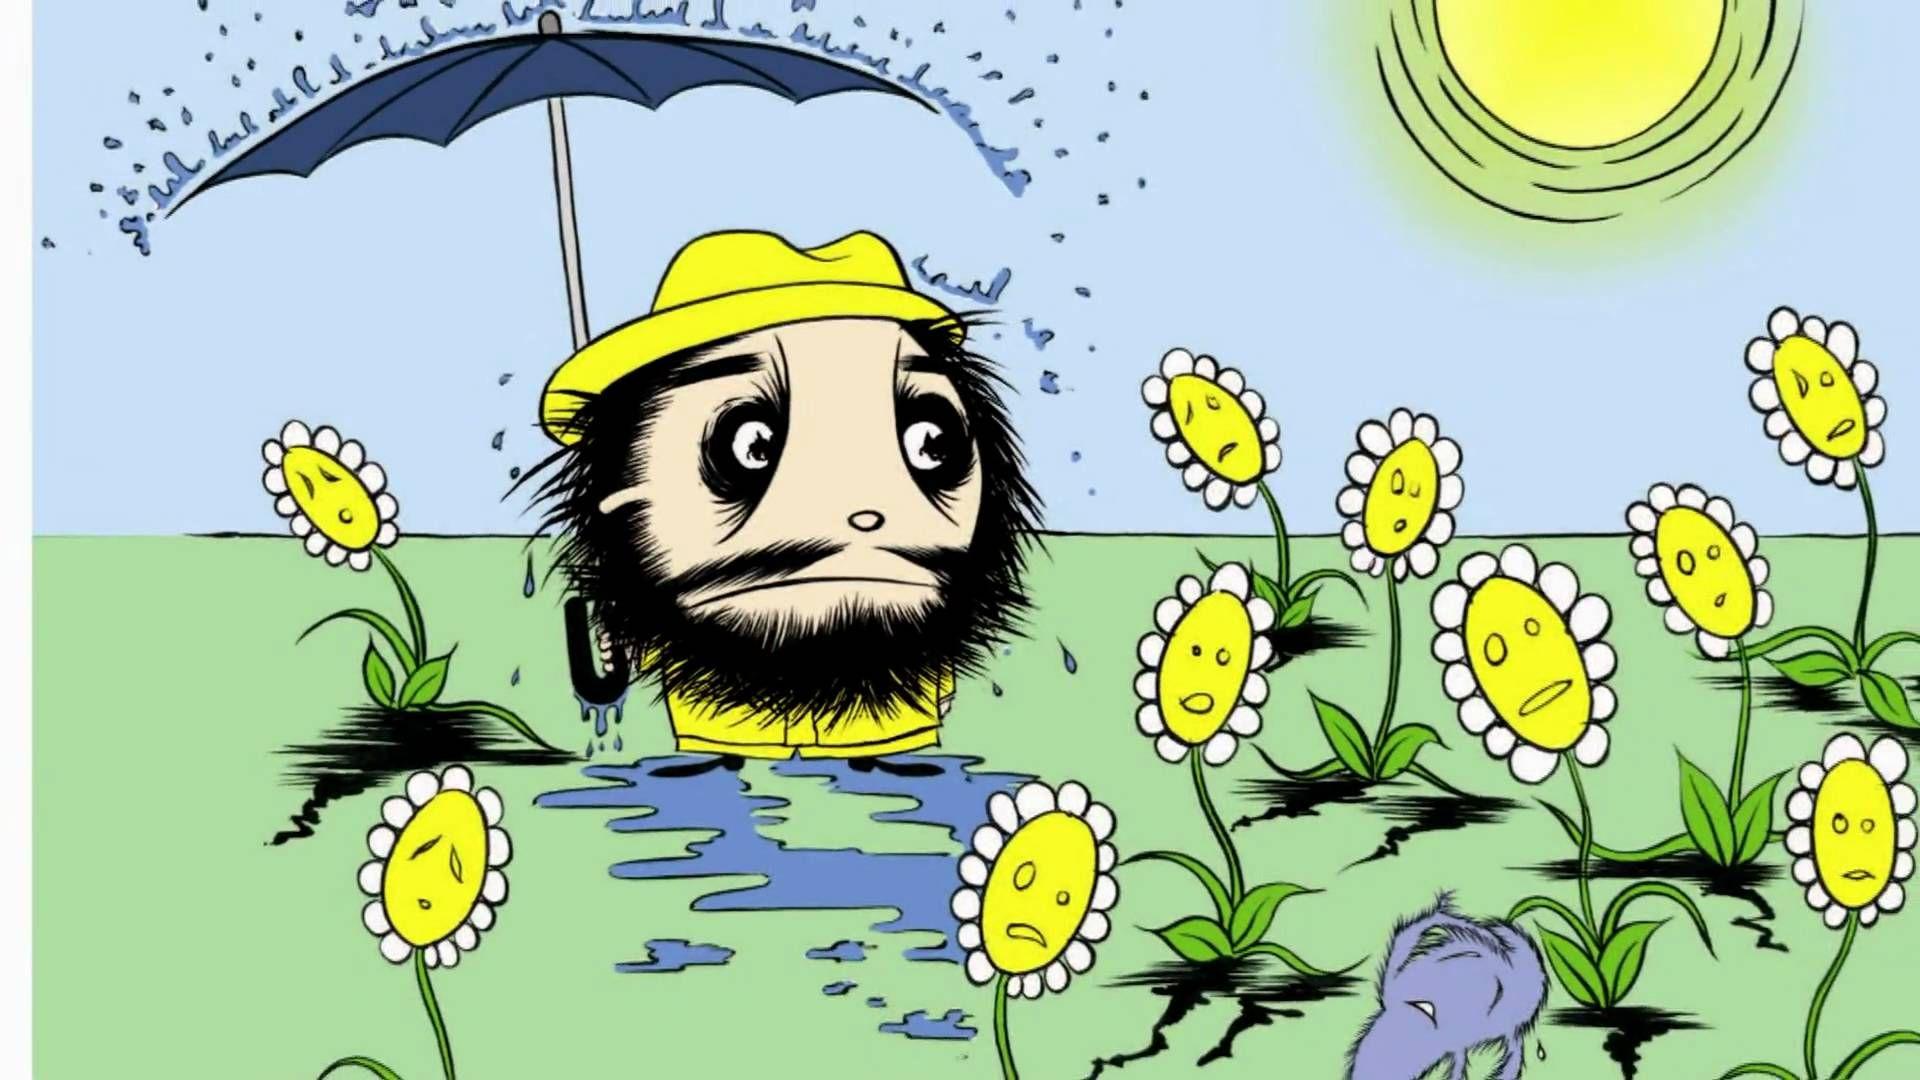 Mr. Gloomingdale's Downpour - Children's Book Read Aloud  Weather